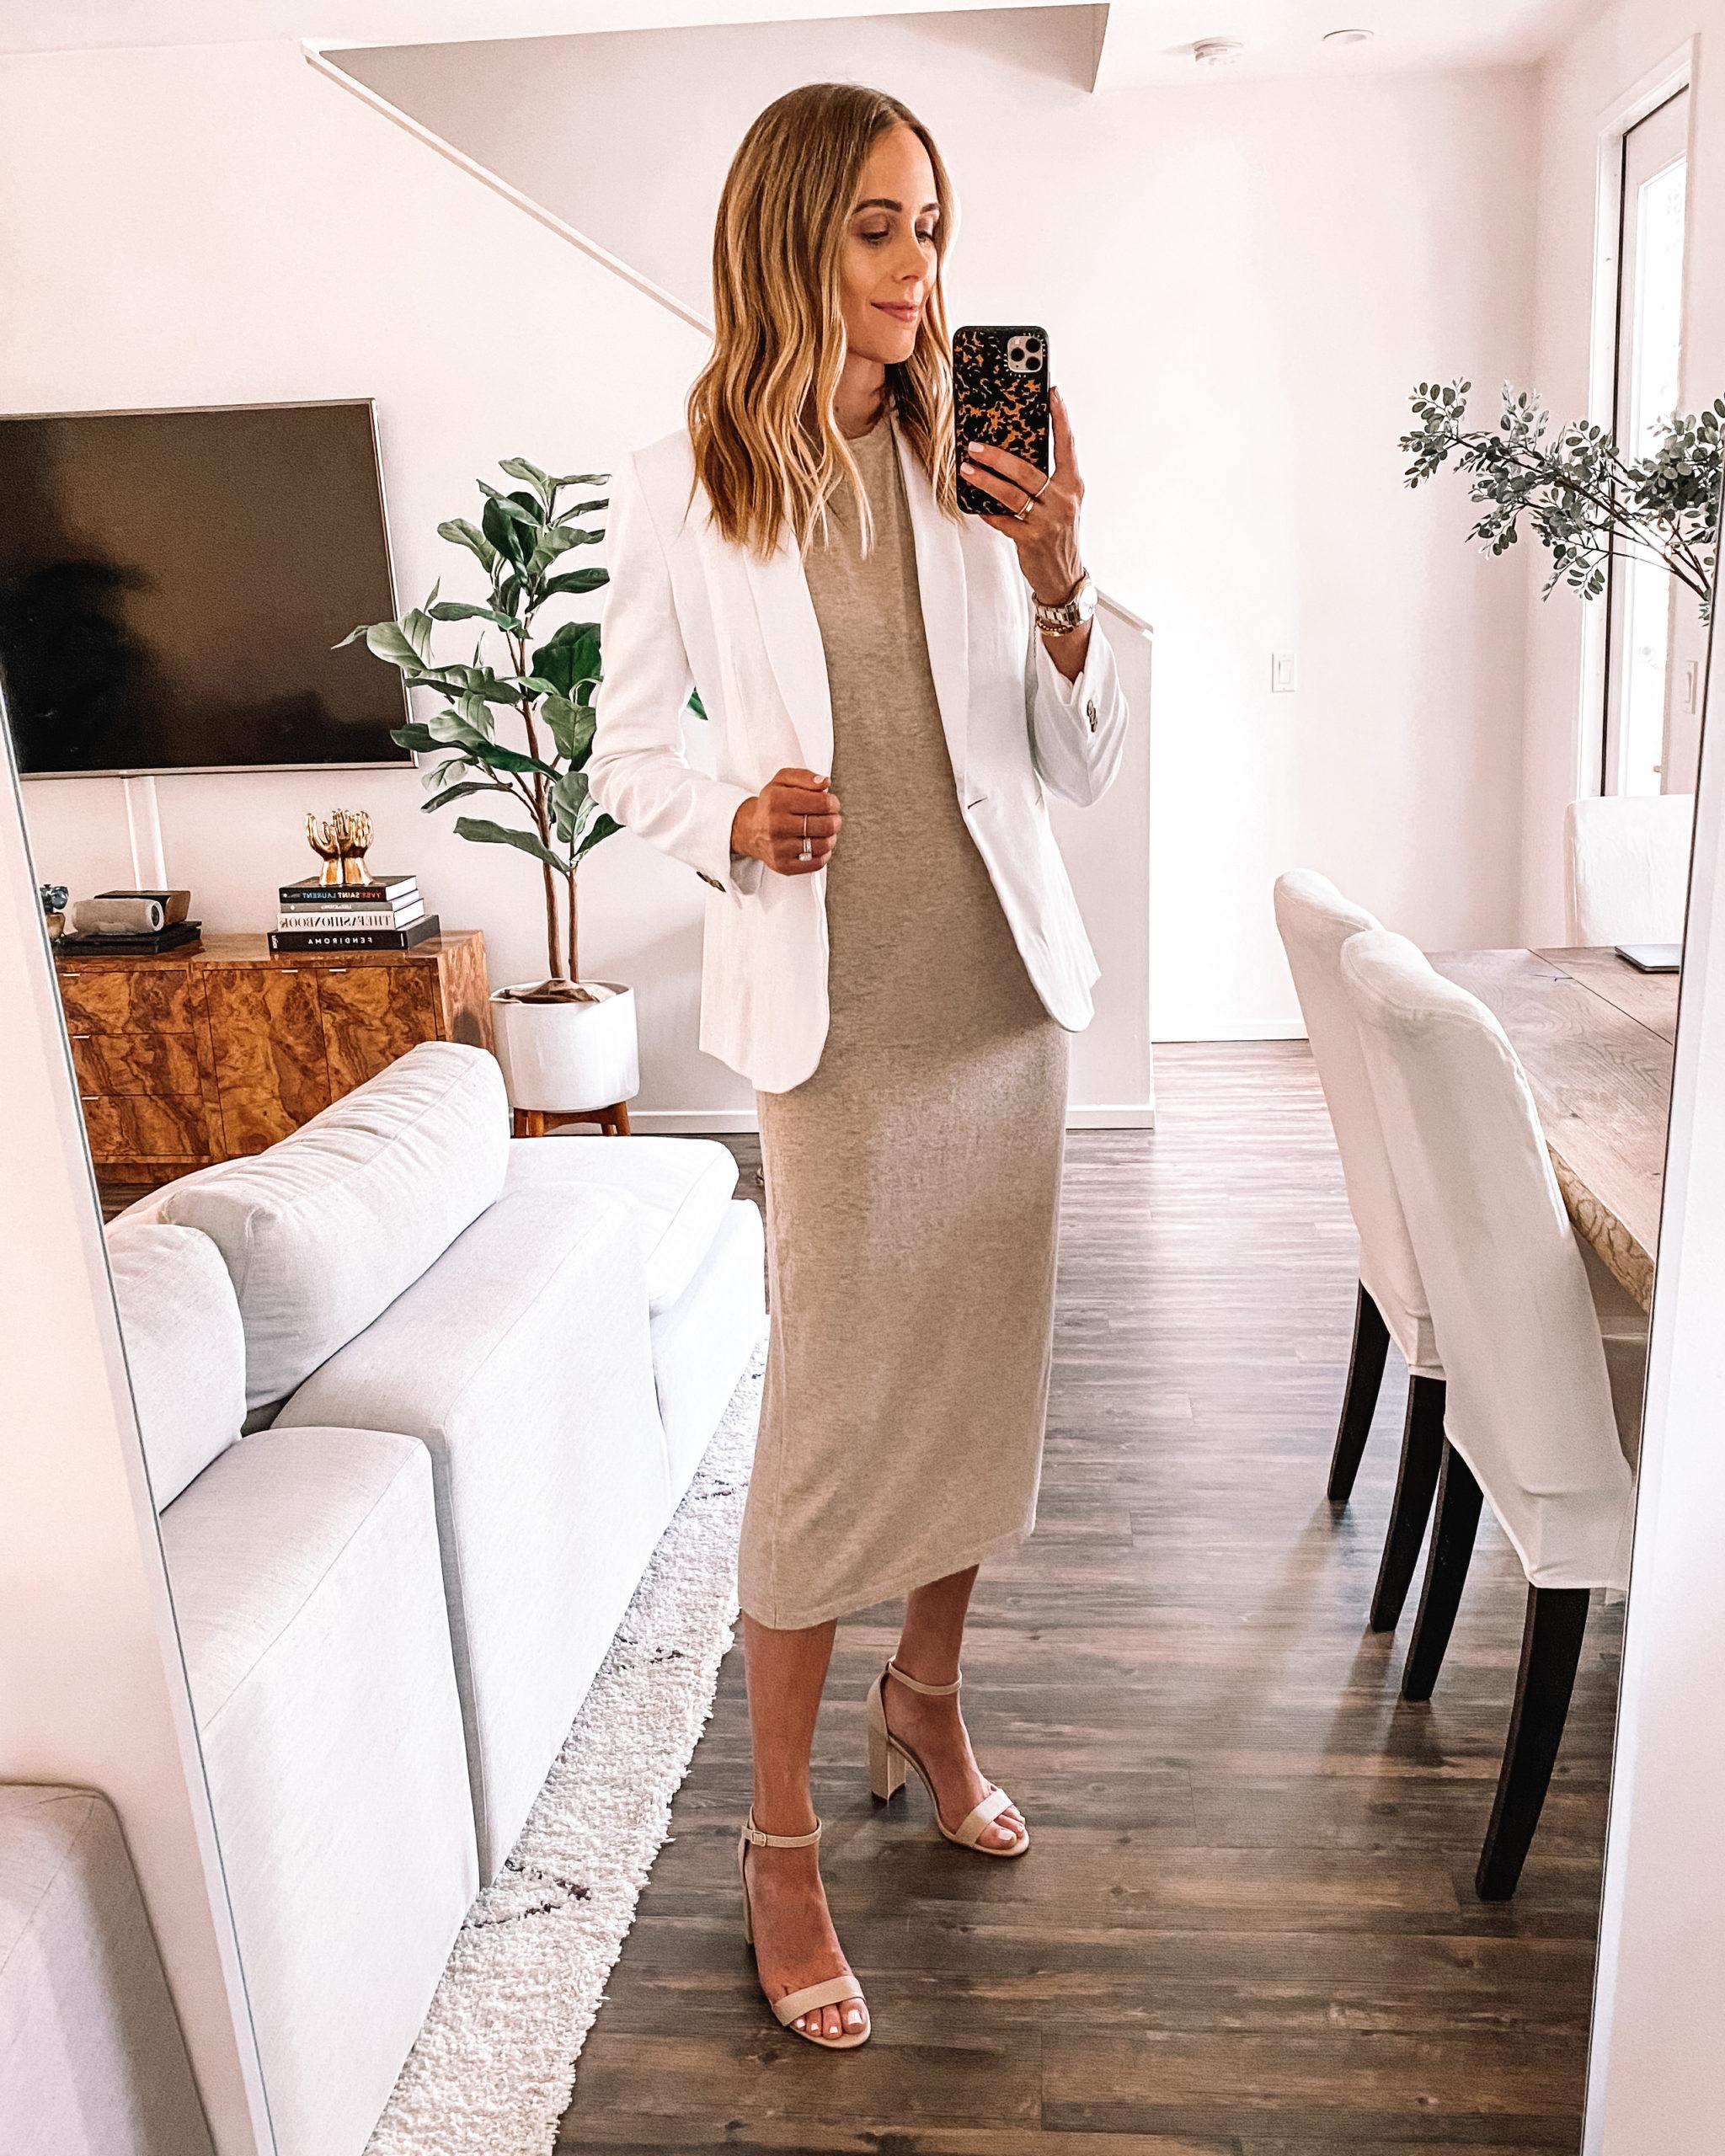 Fashion Jackson Wearing Jenni Kayne Tshirt Dress White Blazer Tan Heeled Sneakers